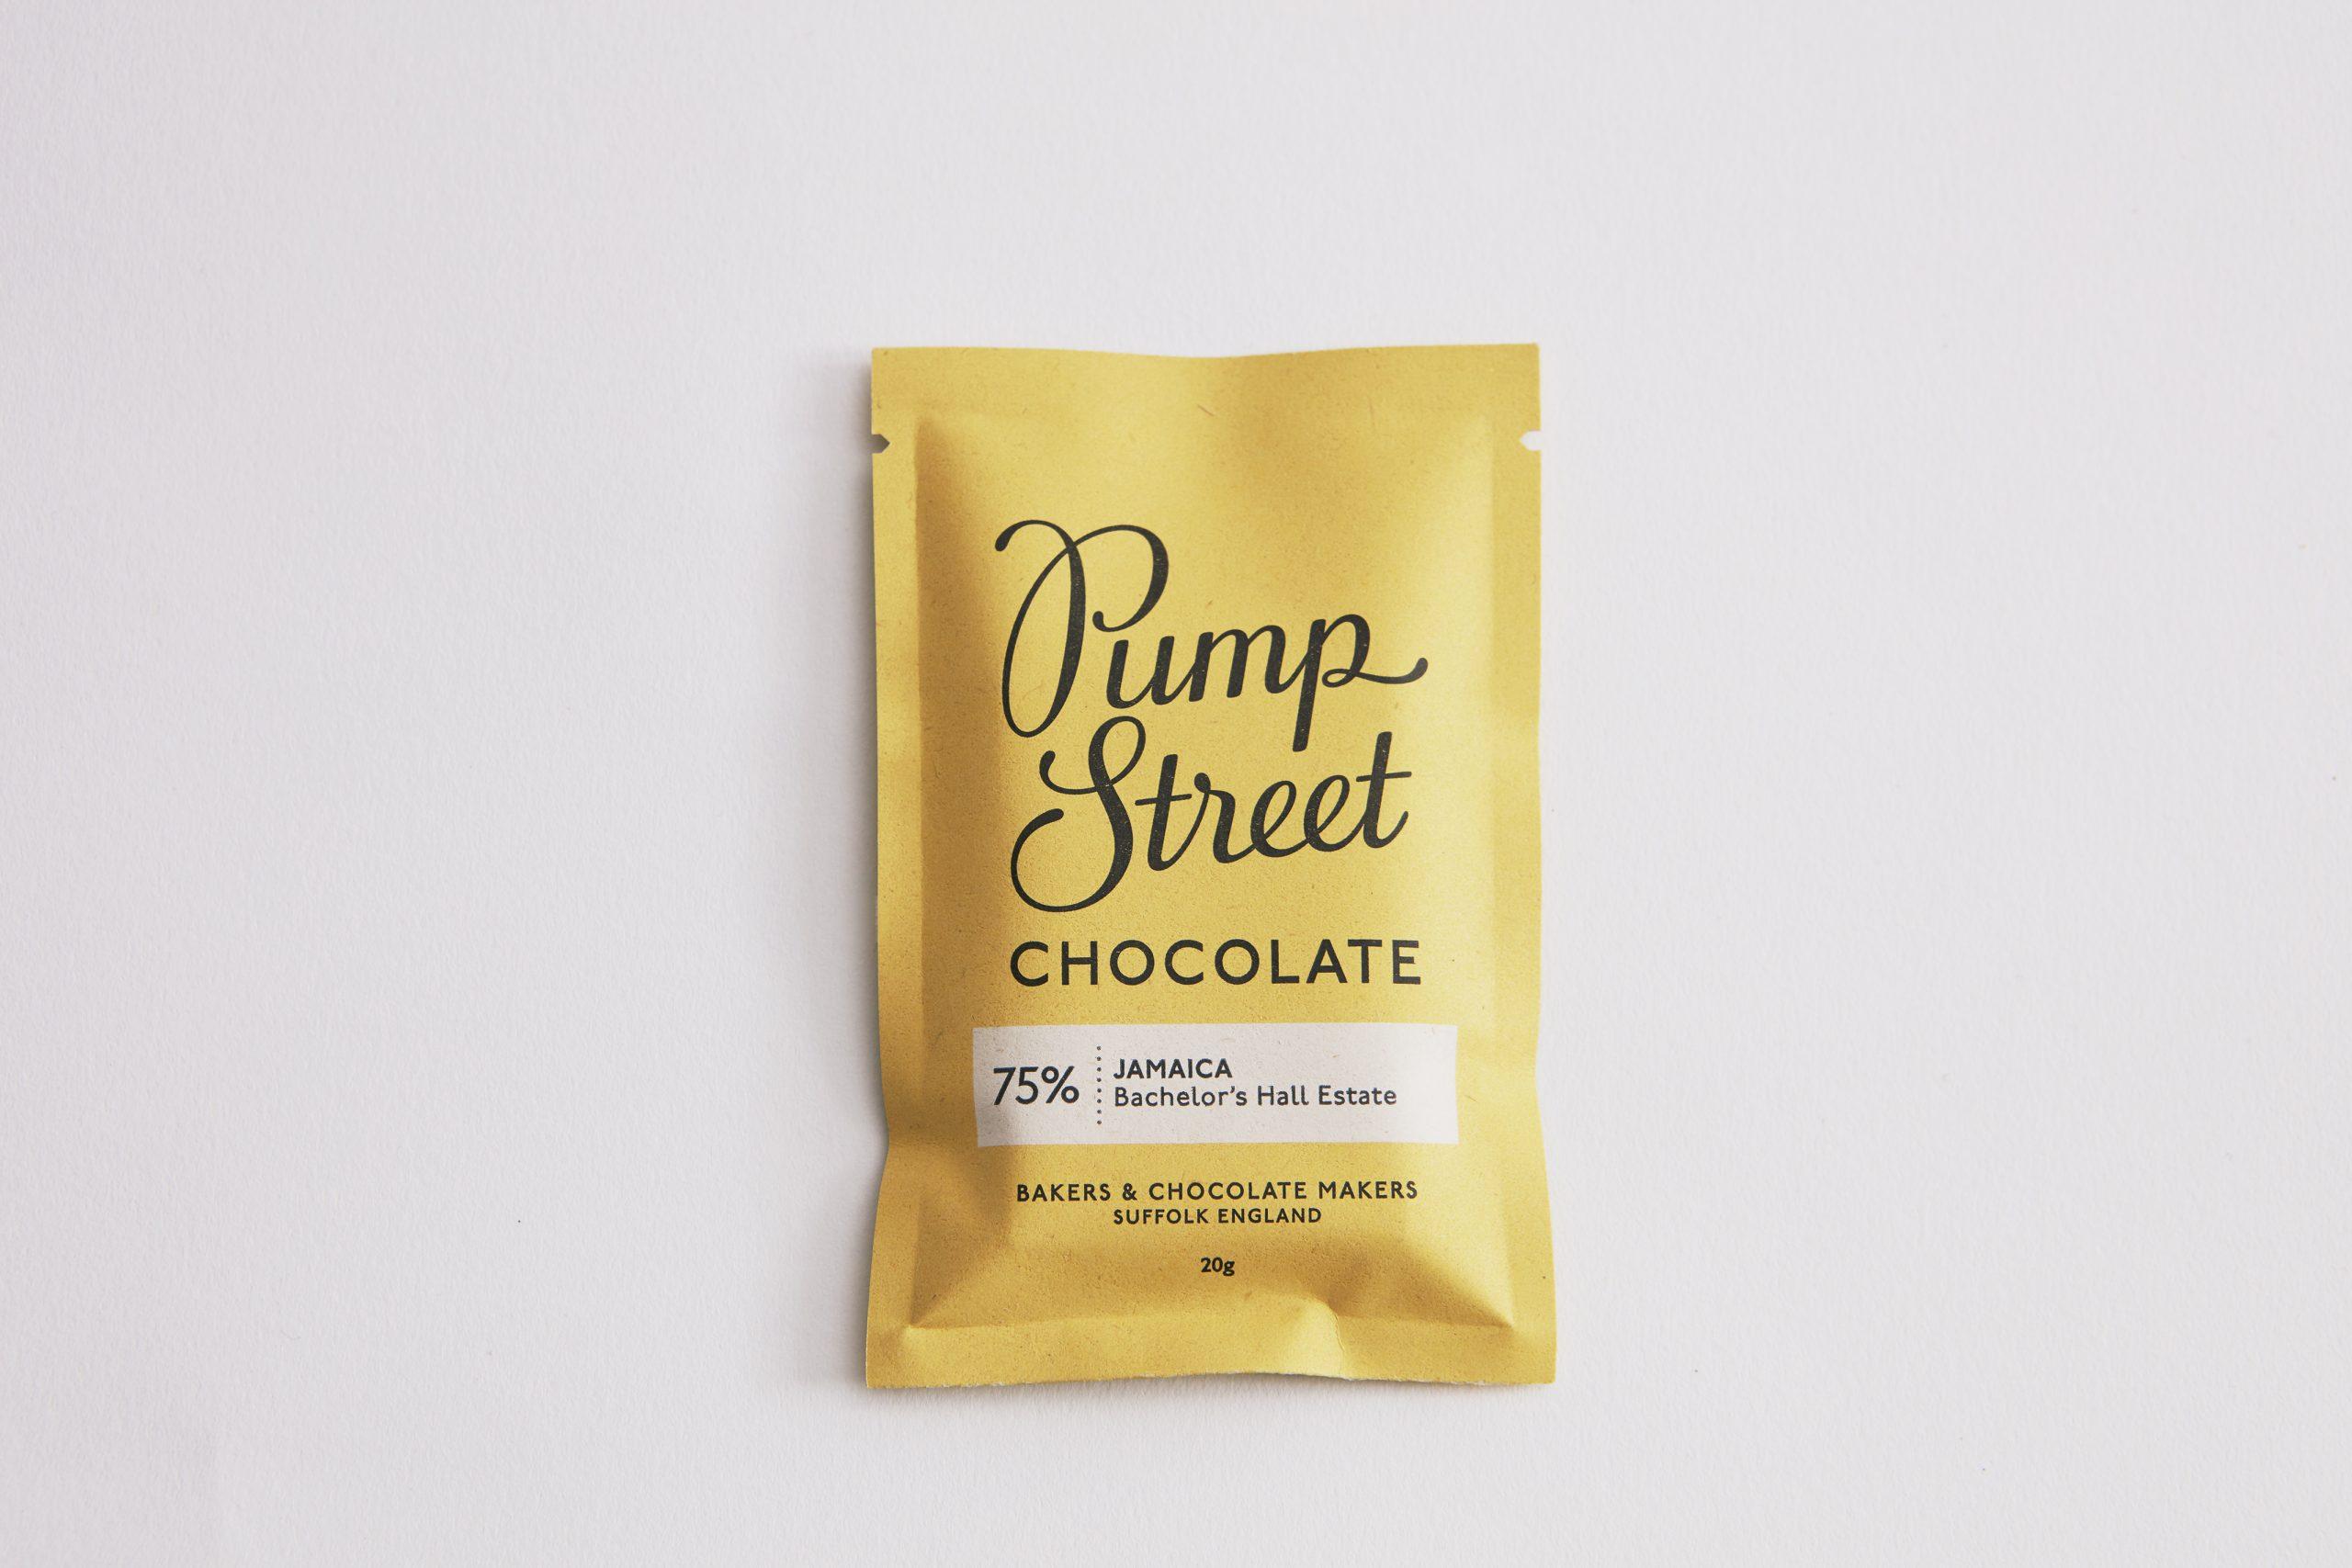 Jamaica 75% - 4x mini bars